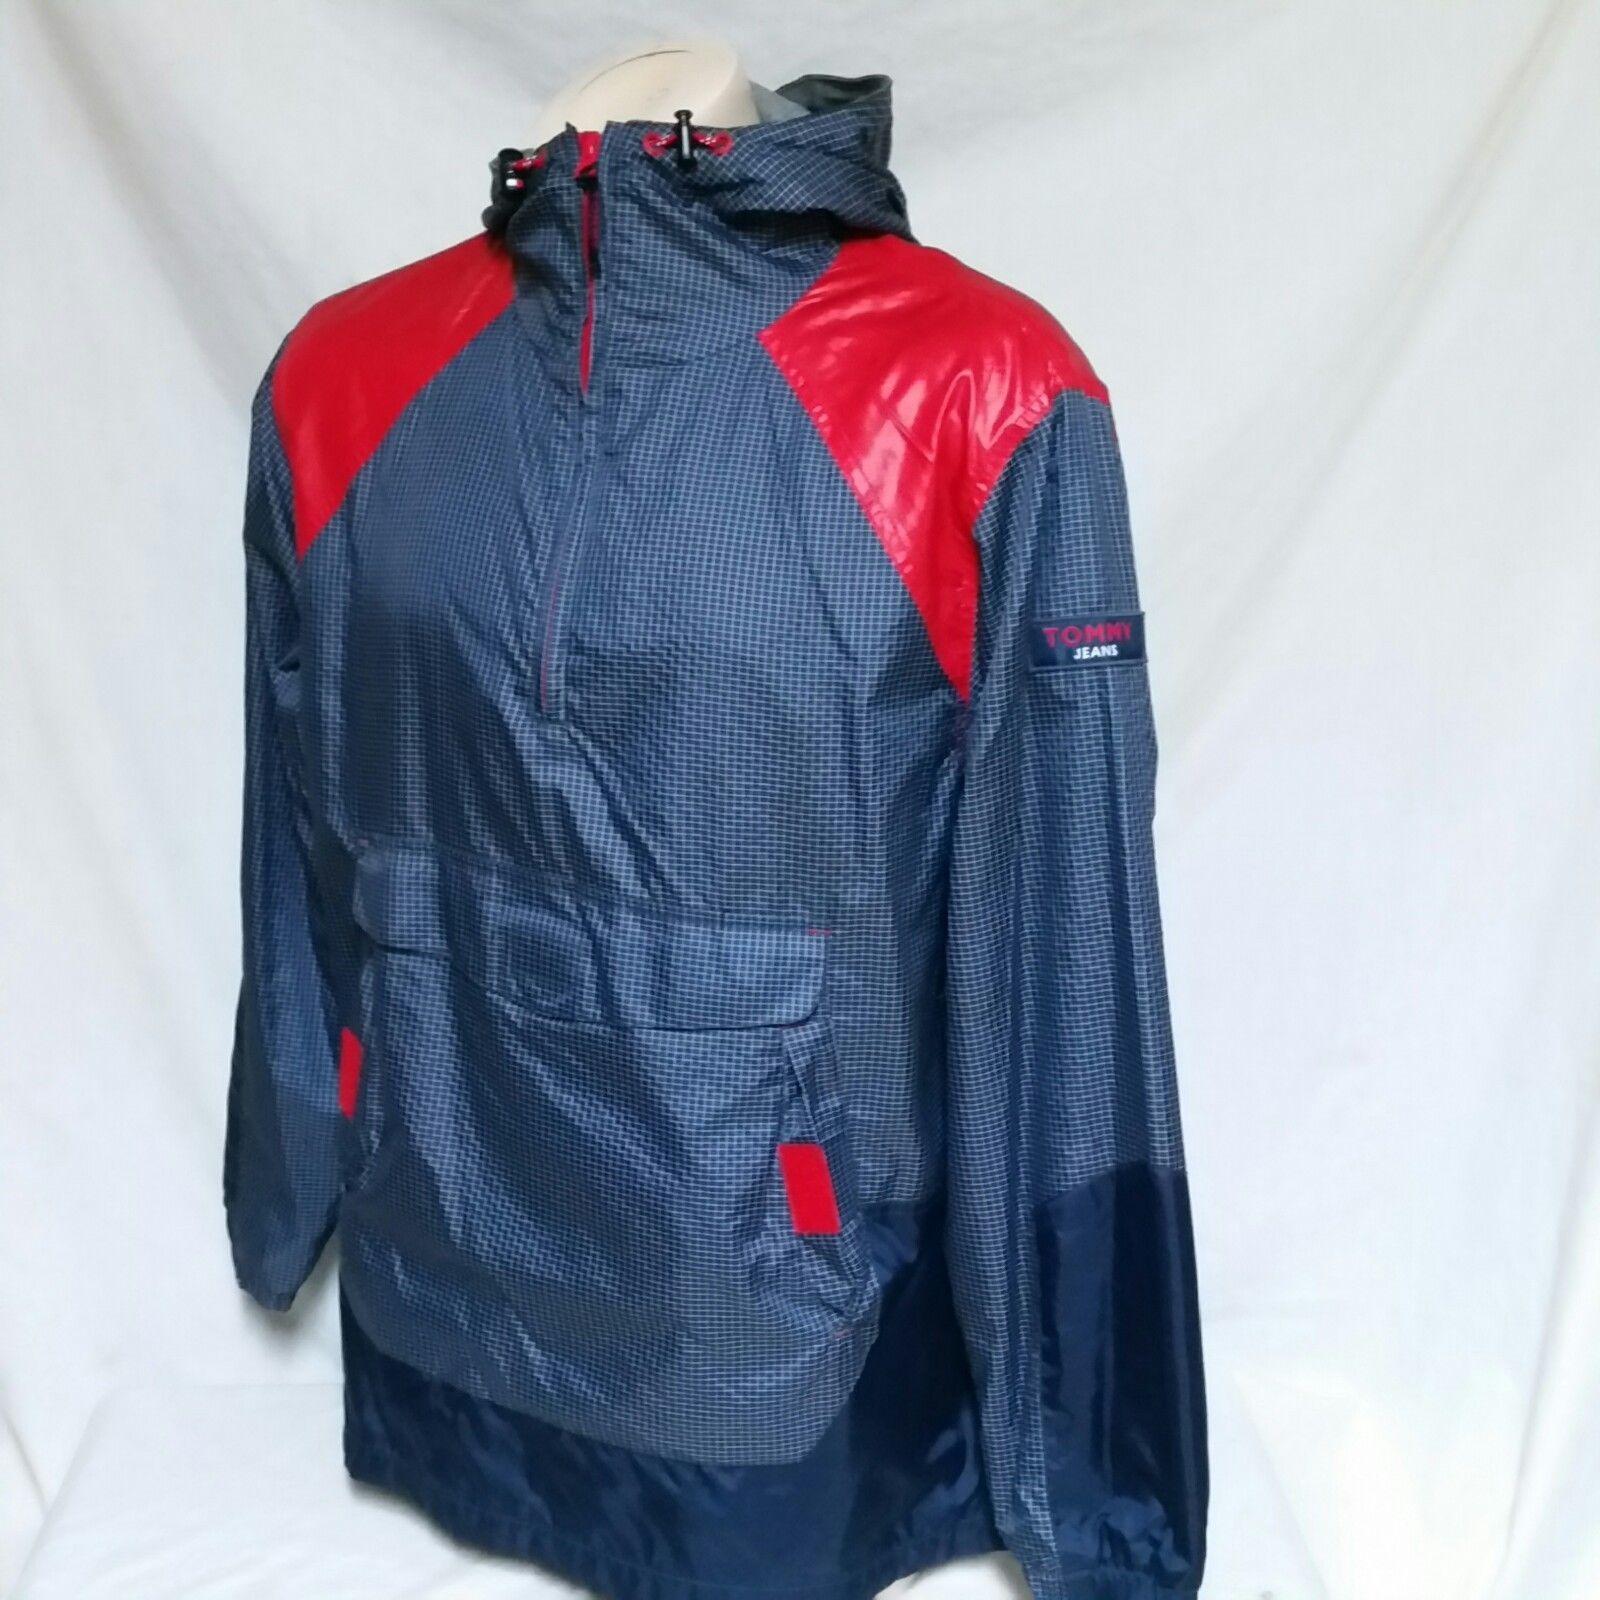 VTG 90s Tommy Hilfiger Jeans Windbreaker Jacket Colorblock Sailing Coat Medium